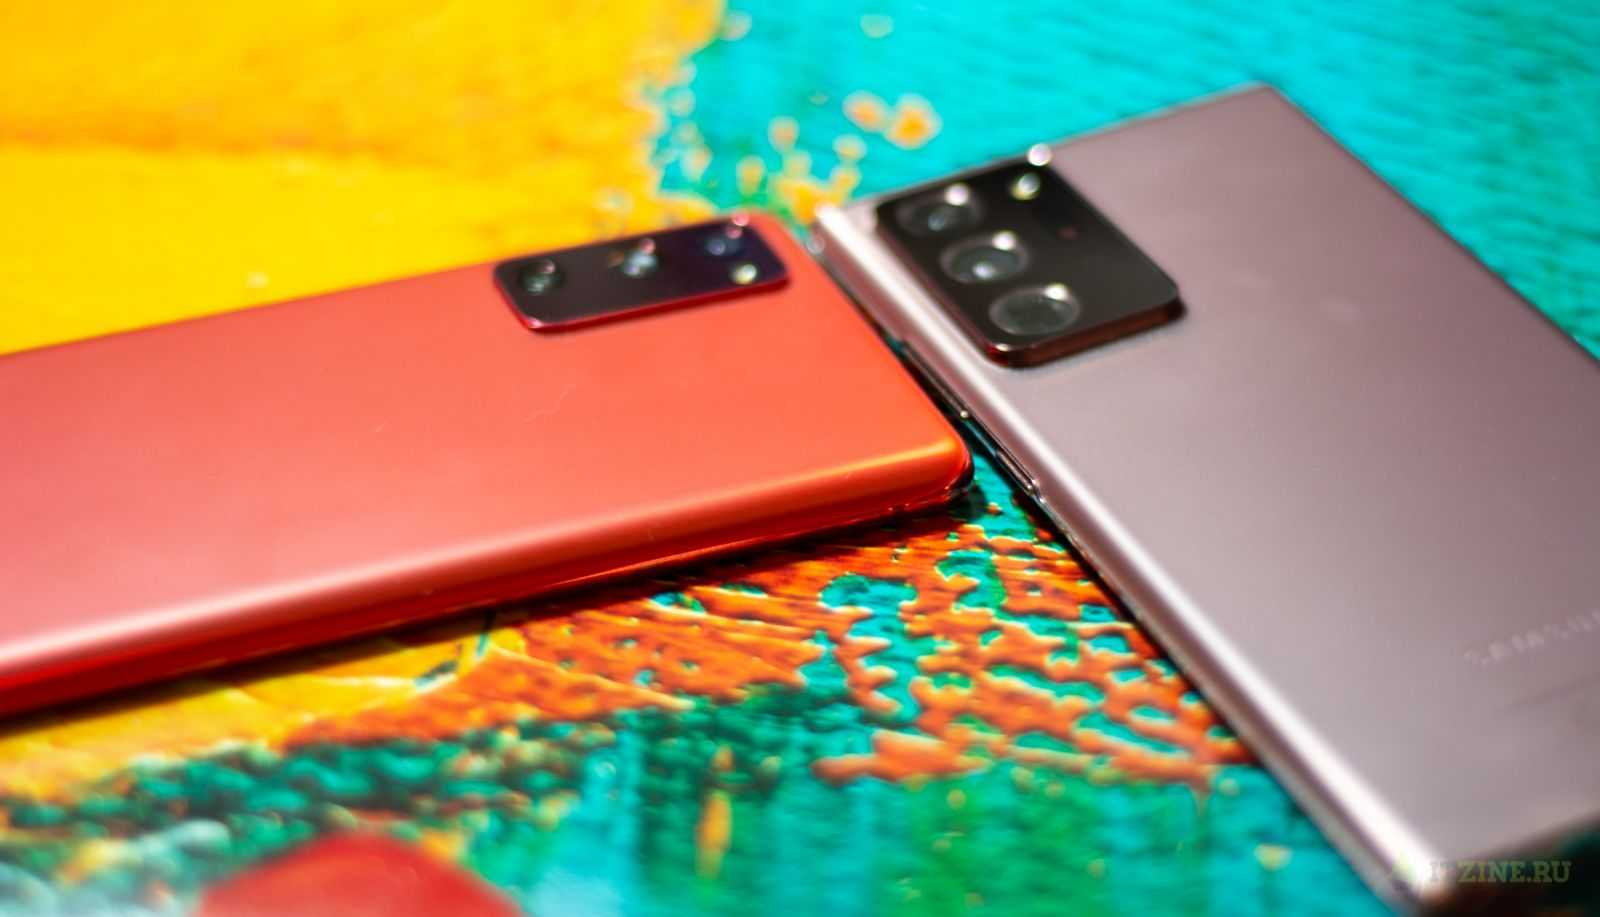 Обзор Samsung Galaxy S20 FE: недорогой, но флагман (DSC 9769)